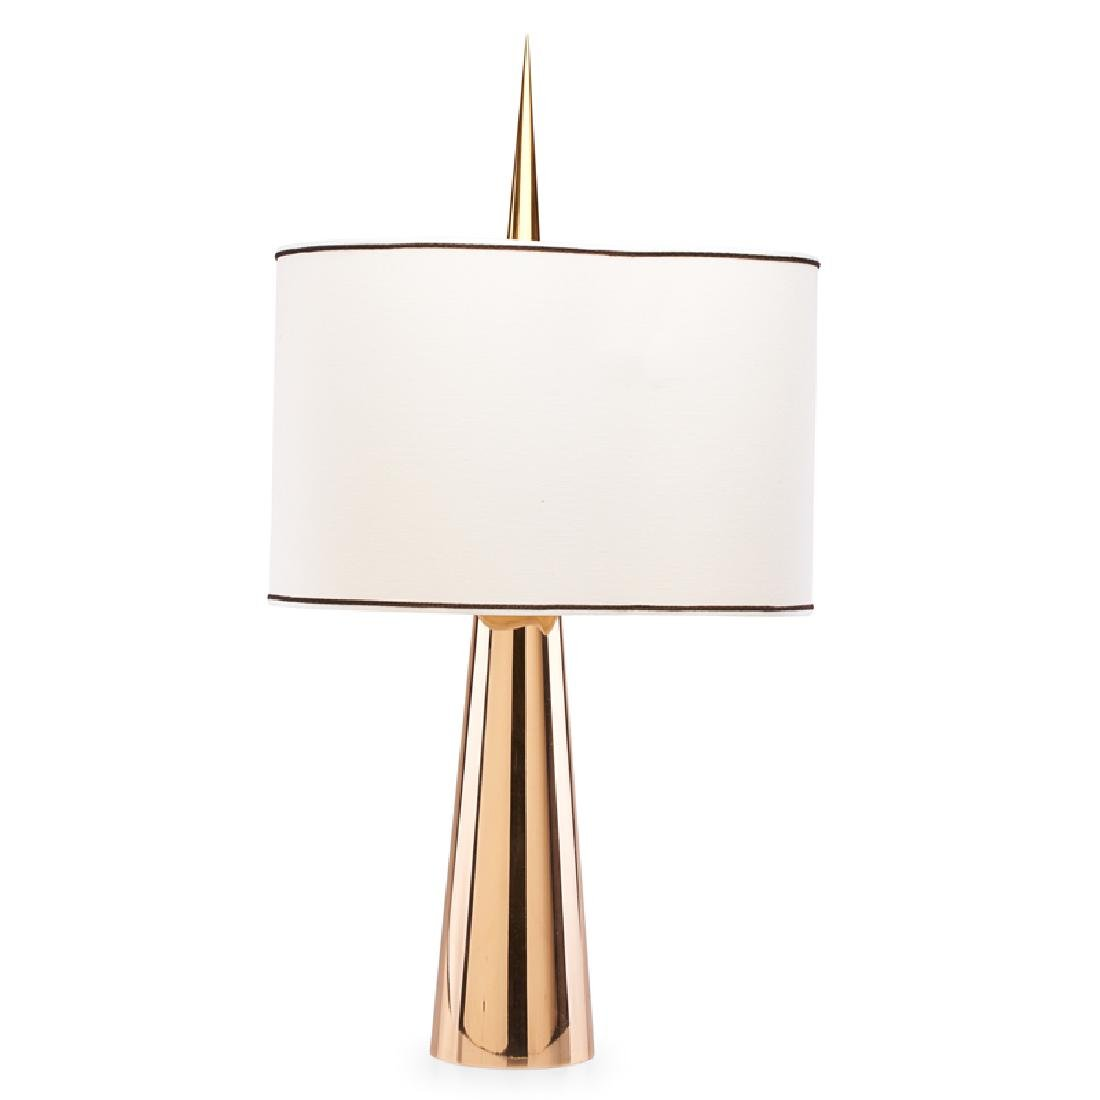 ACHILLE SALVAGNI Table lamp